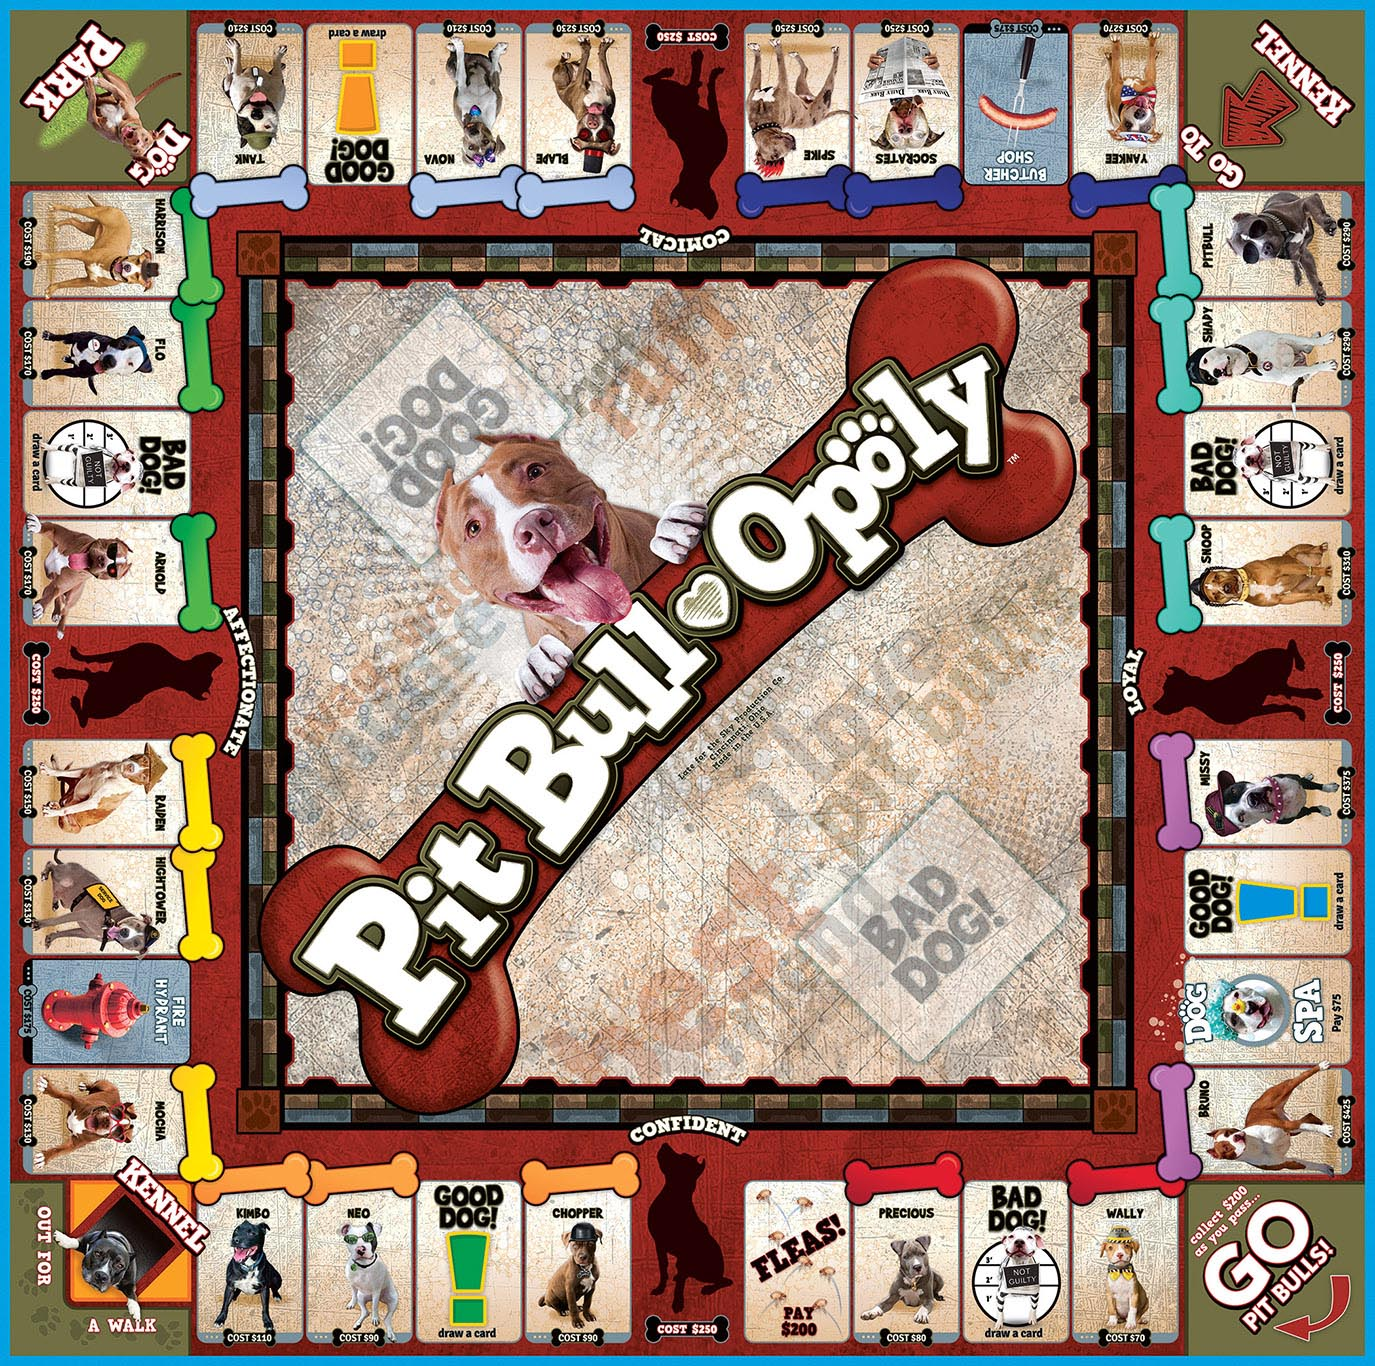 PITBULL-OPOLY Board Game